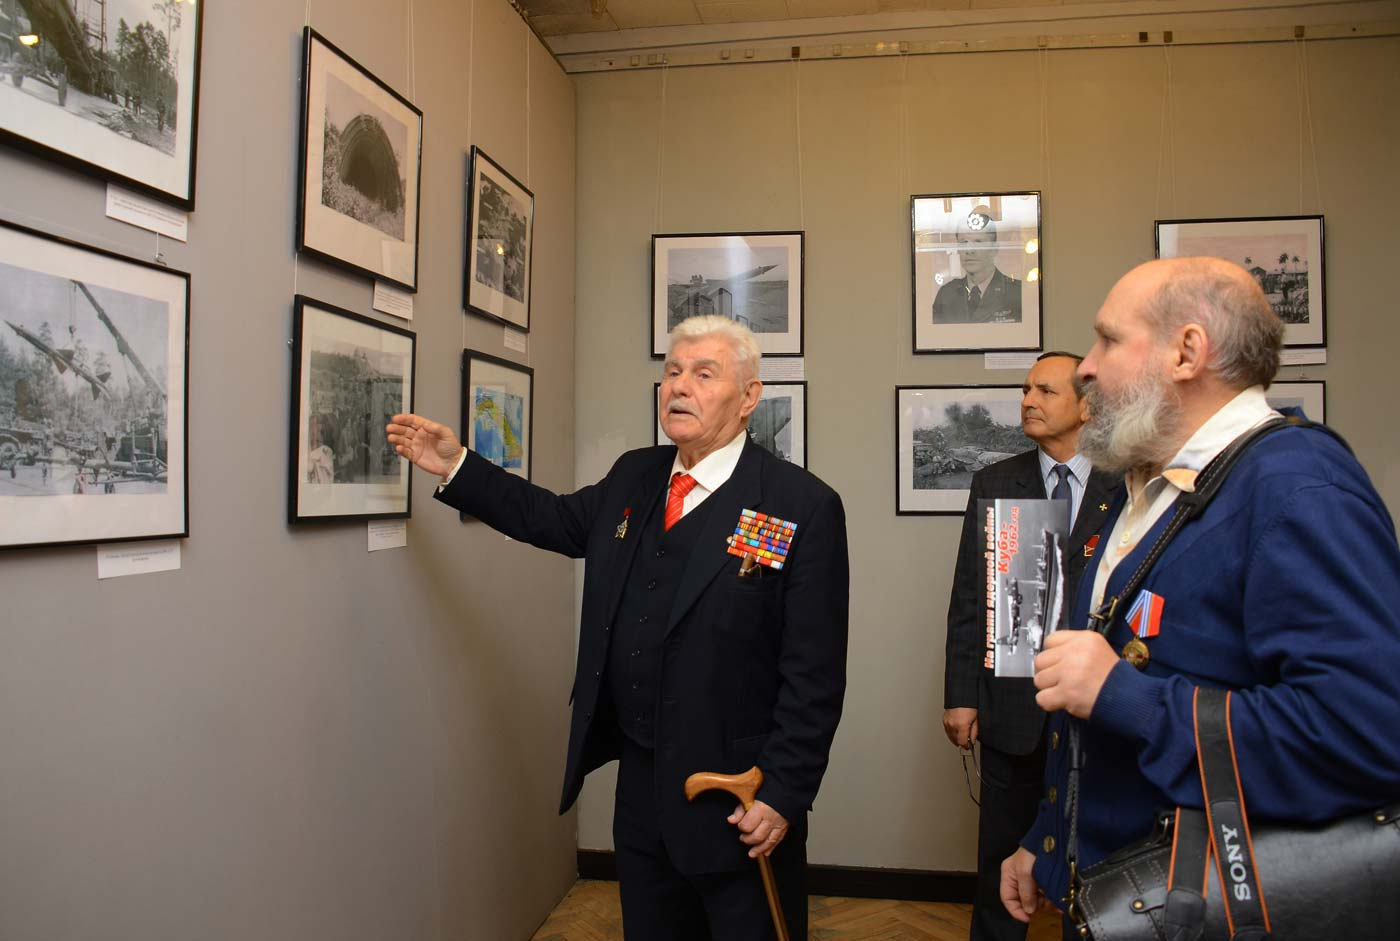 2016-10-27. Снимки от организаторов выставки. Фото 3